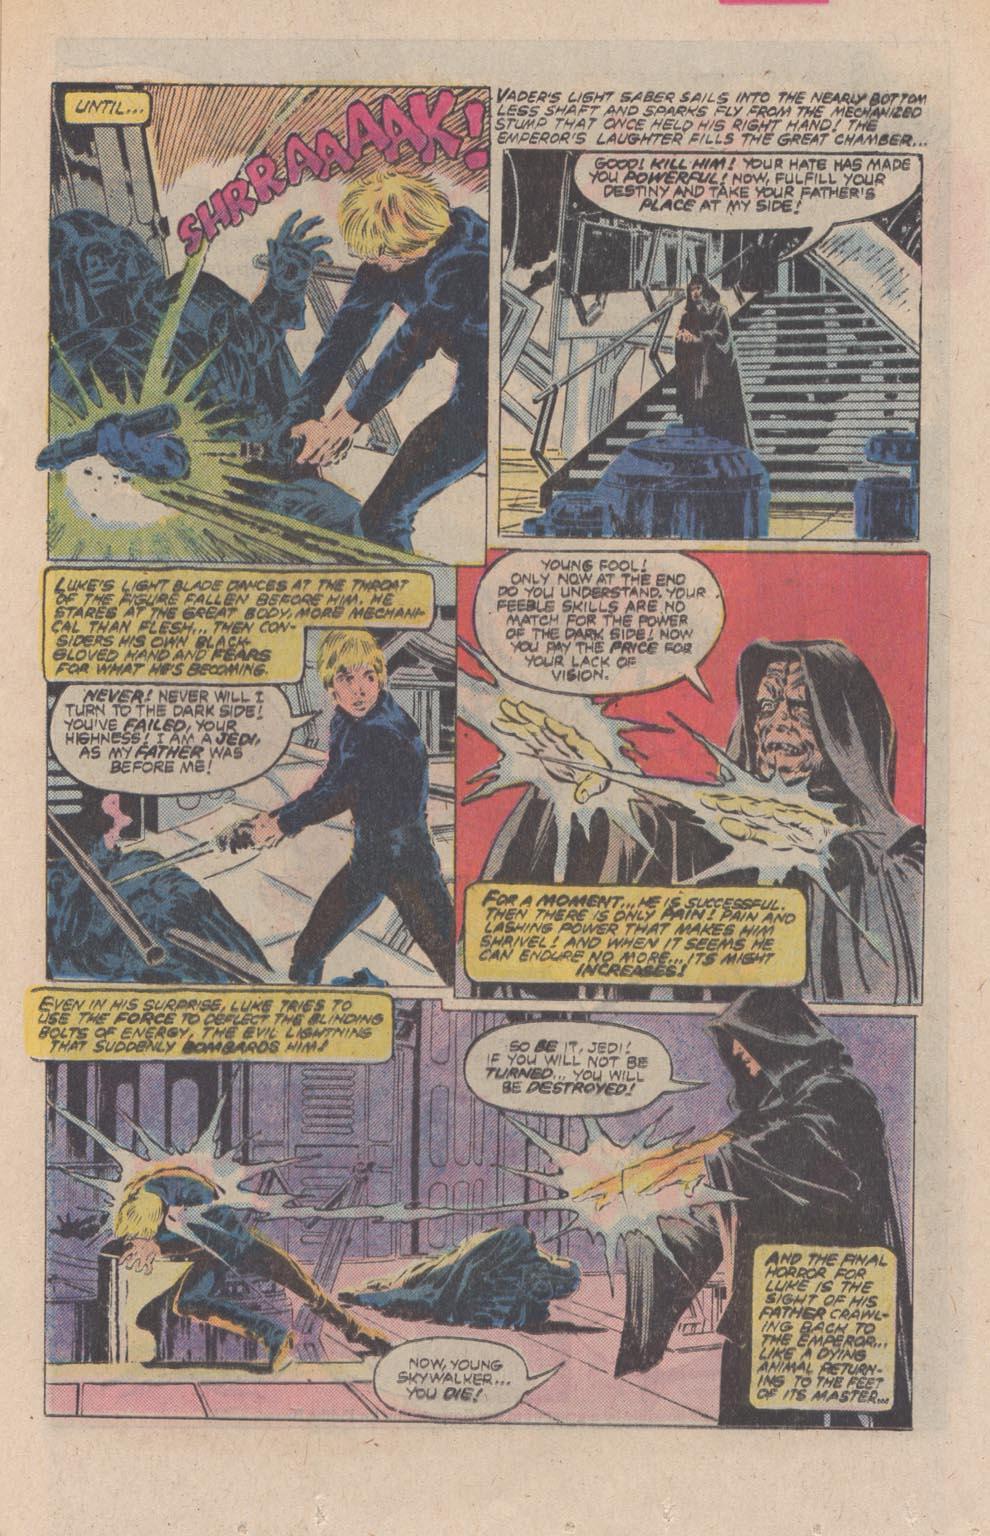 Read online Star Wars: Return of the Jedi comic -  Issue #4 - 15